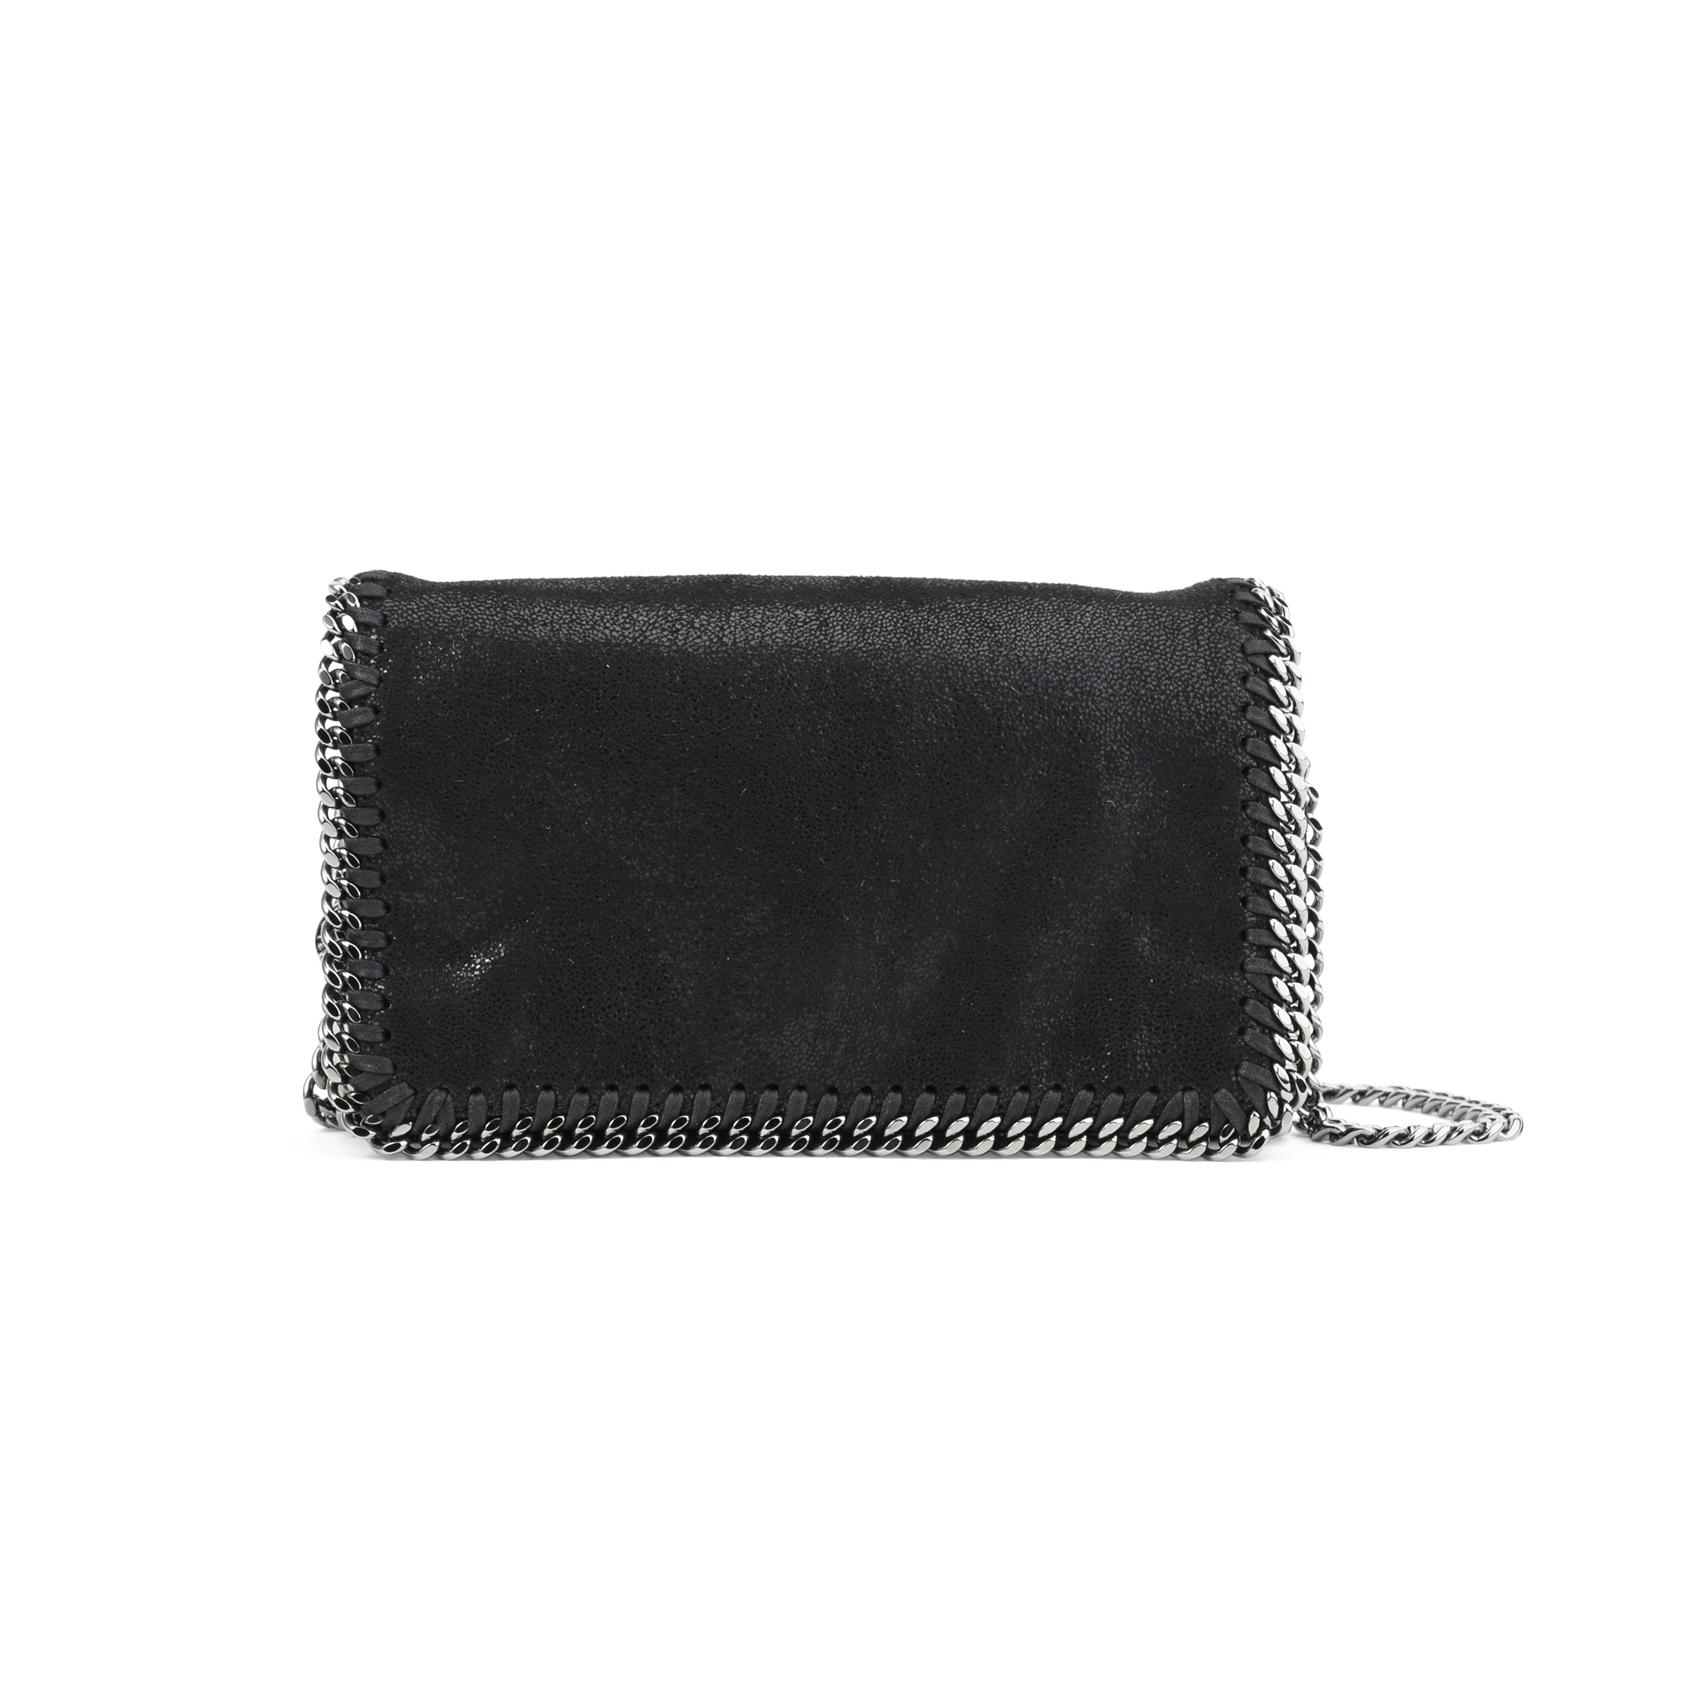 4f50484836 Authentic Second Hand Stella McCartney Falabella Crossbody Bag  (PSS-001-00034)